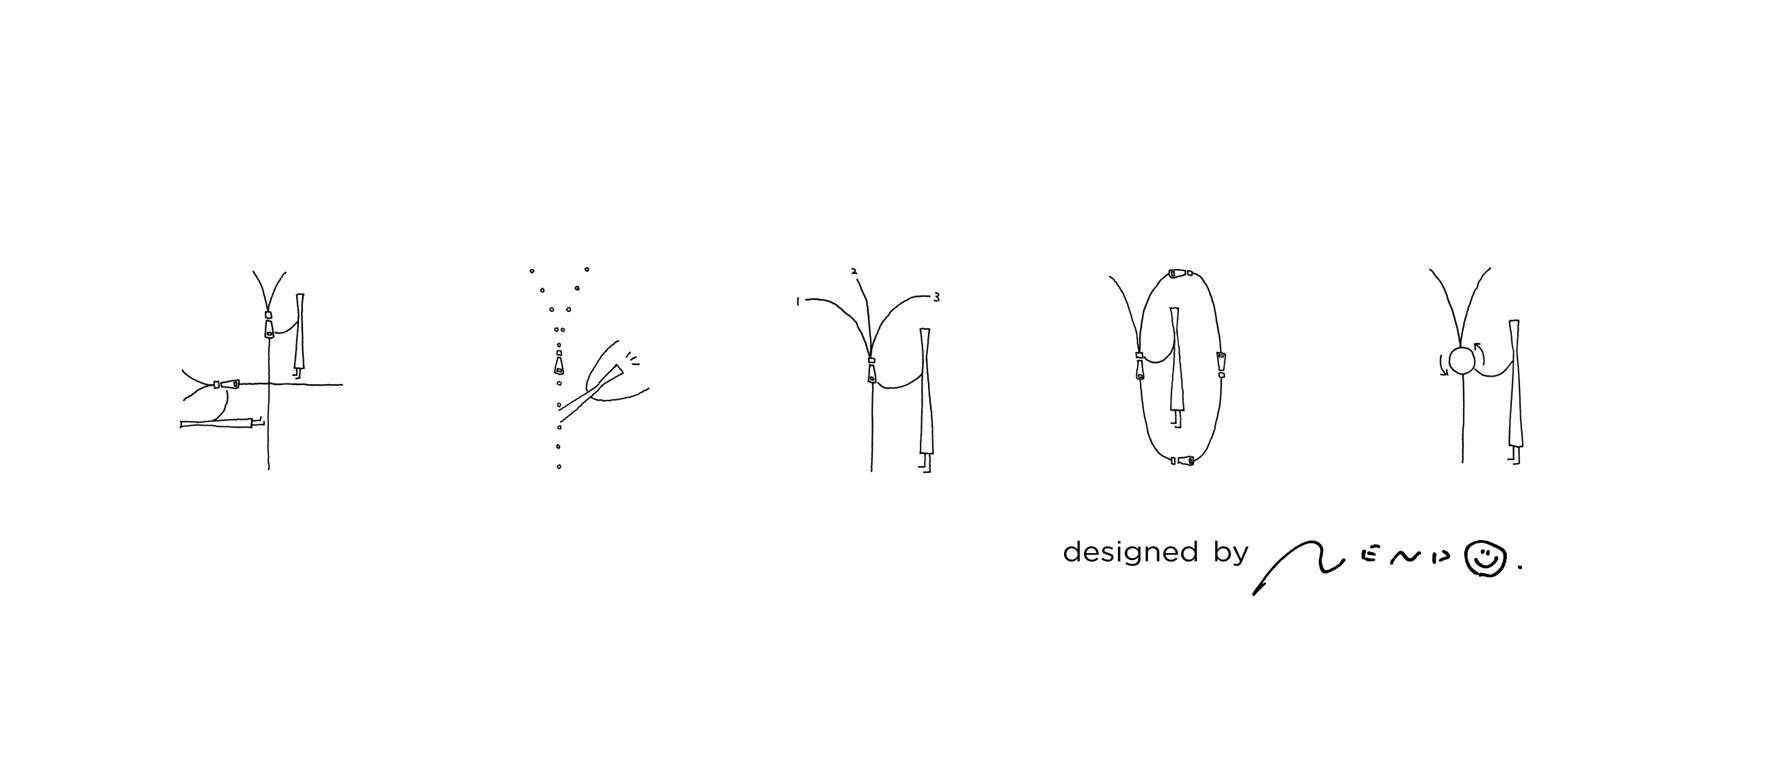 Zipper Ts Wiring Diagram on pa wiring diagram, sg wiring diagram, tx wiring diagram, hs wiring diagram, sh wiring diagram, mod wiring diagram, cb wiring diagram, pc wiring diagram, wd wiring diagram, mov wiring diagram, st wiring diagram, cr wiring diagram, cm wiring diagram, tc wiring diagram, mc wiring diagram, iso wiring diagram, hd wiring diagram, bi wiring diagram, ml wiring diagram,